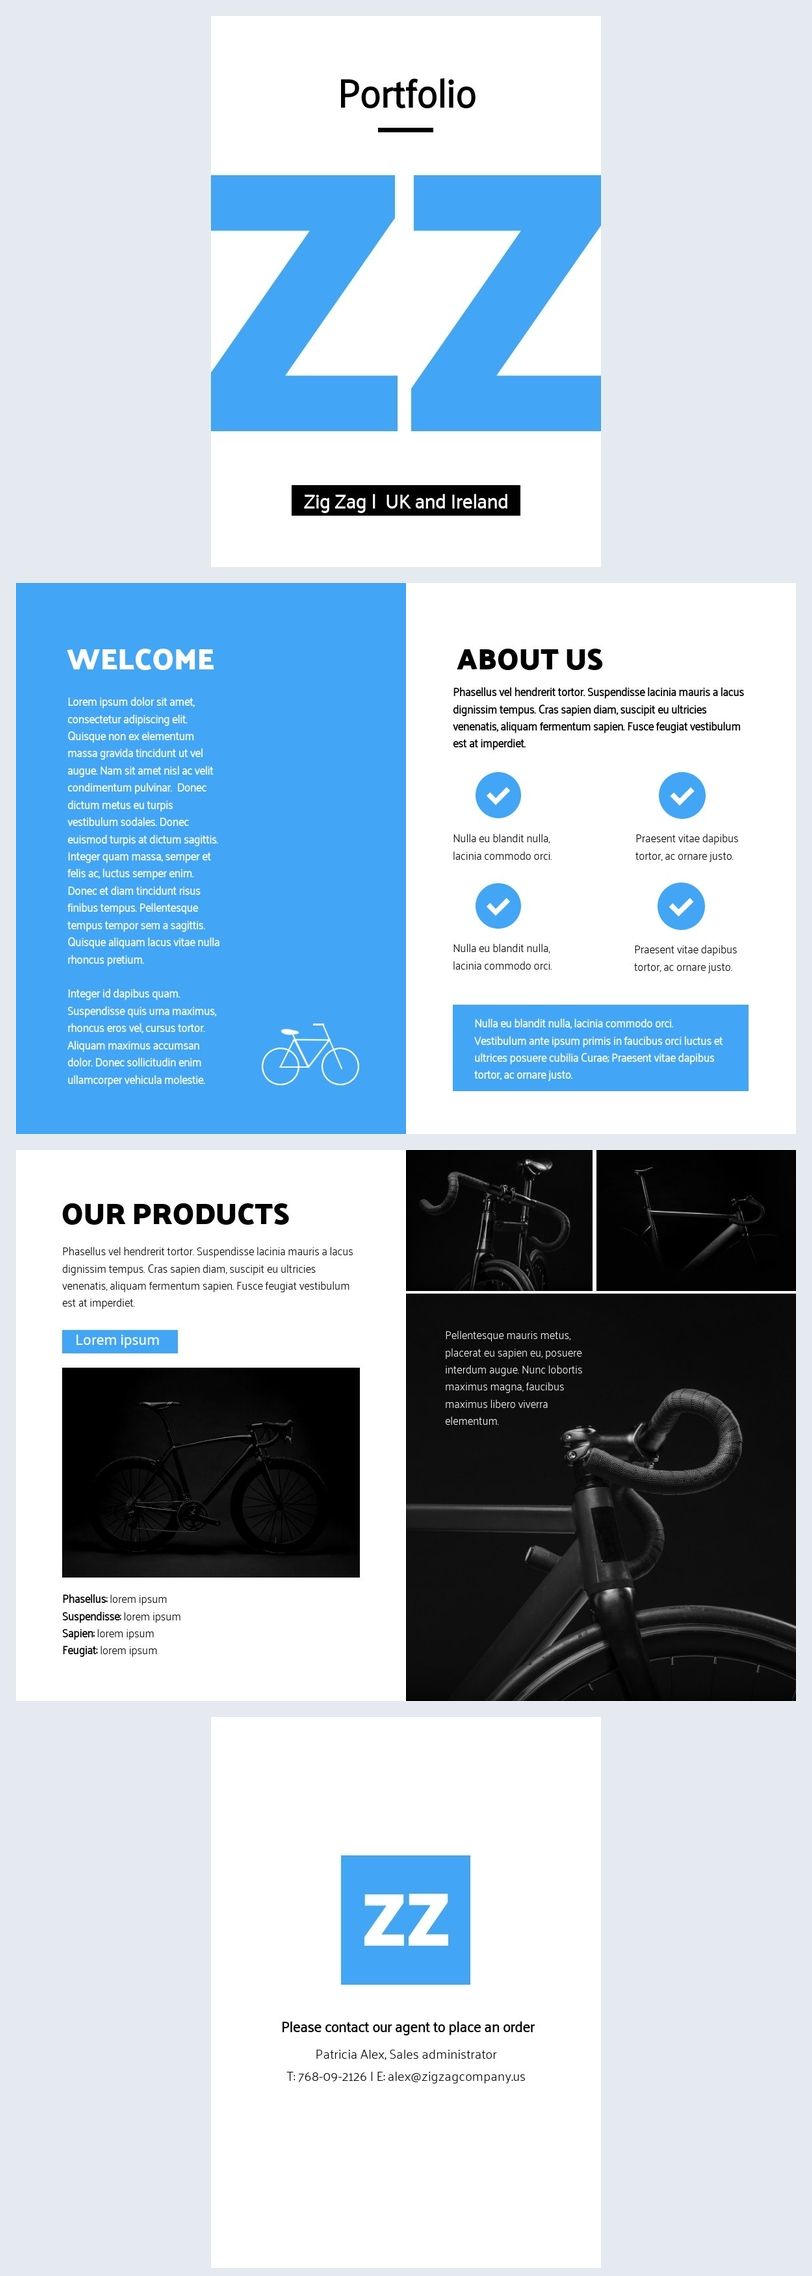 company portfolio layout design